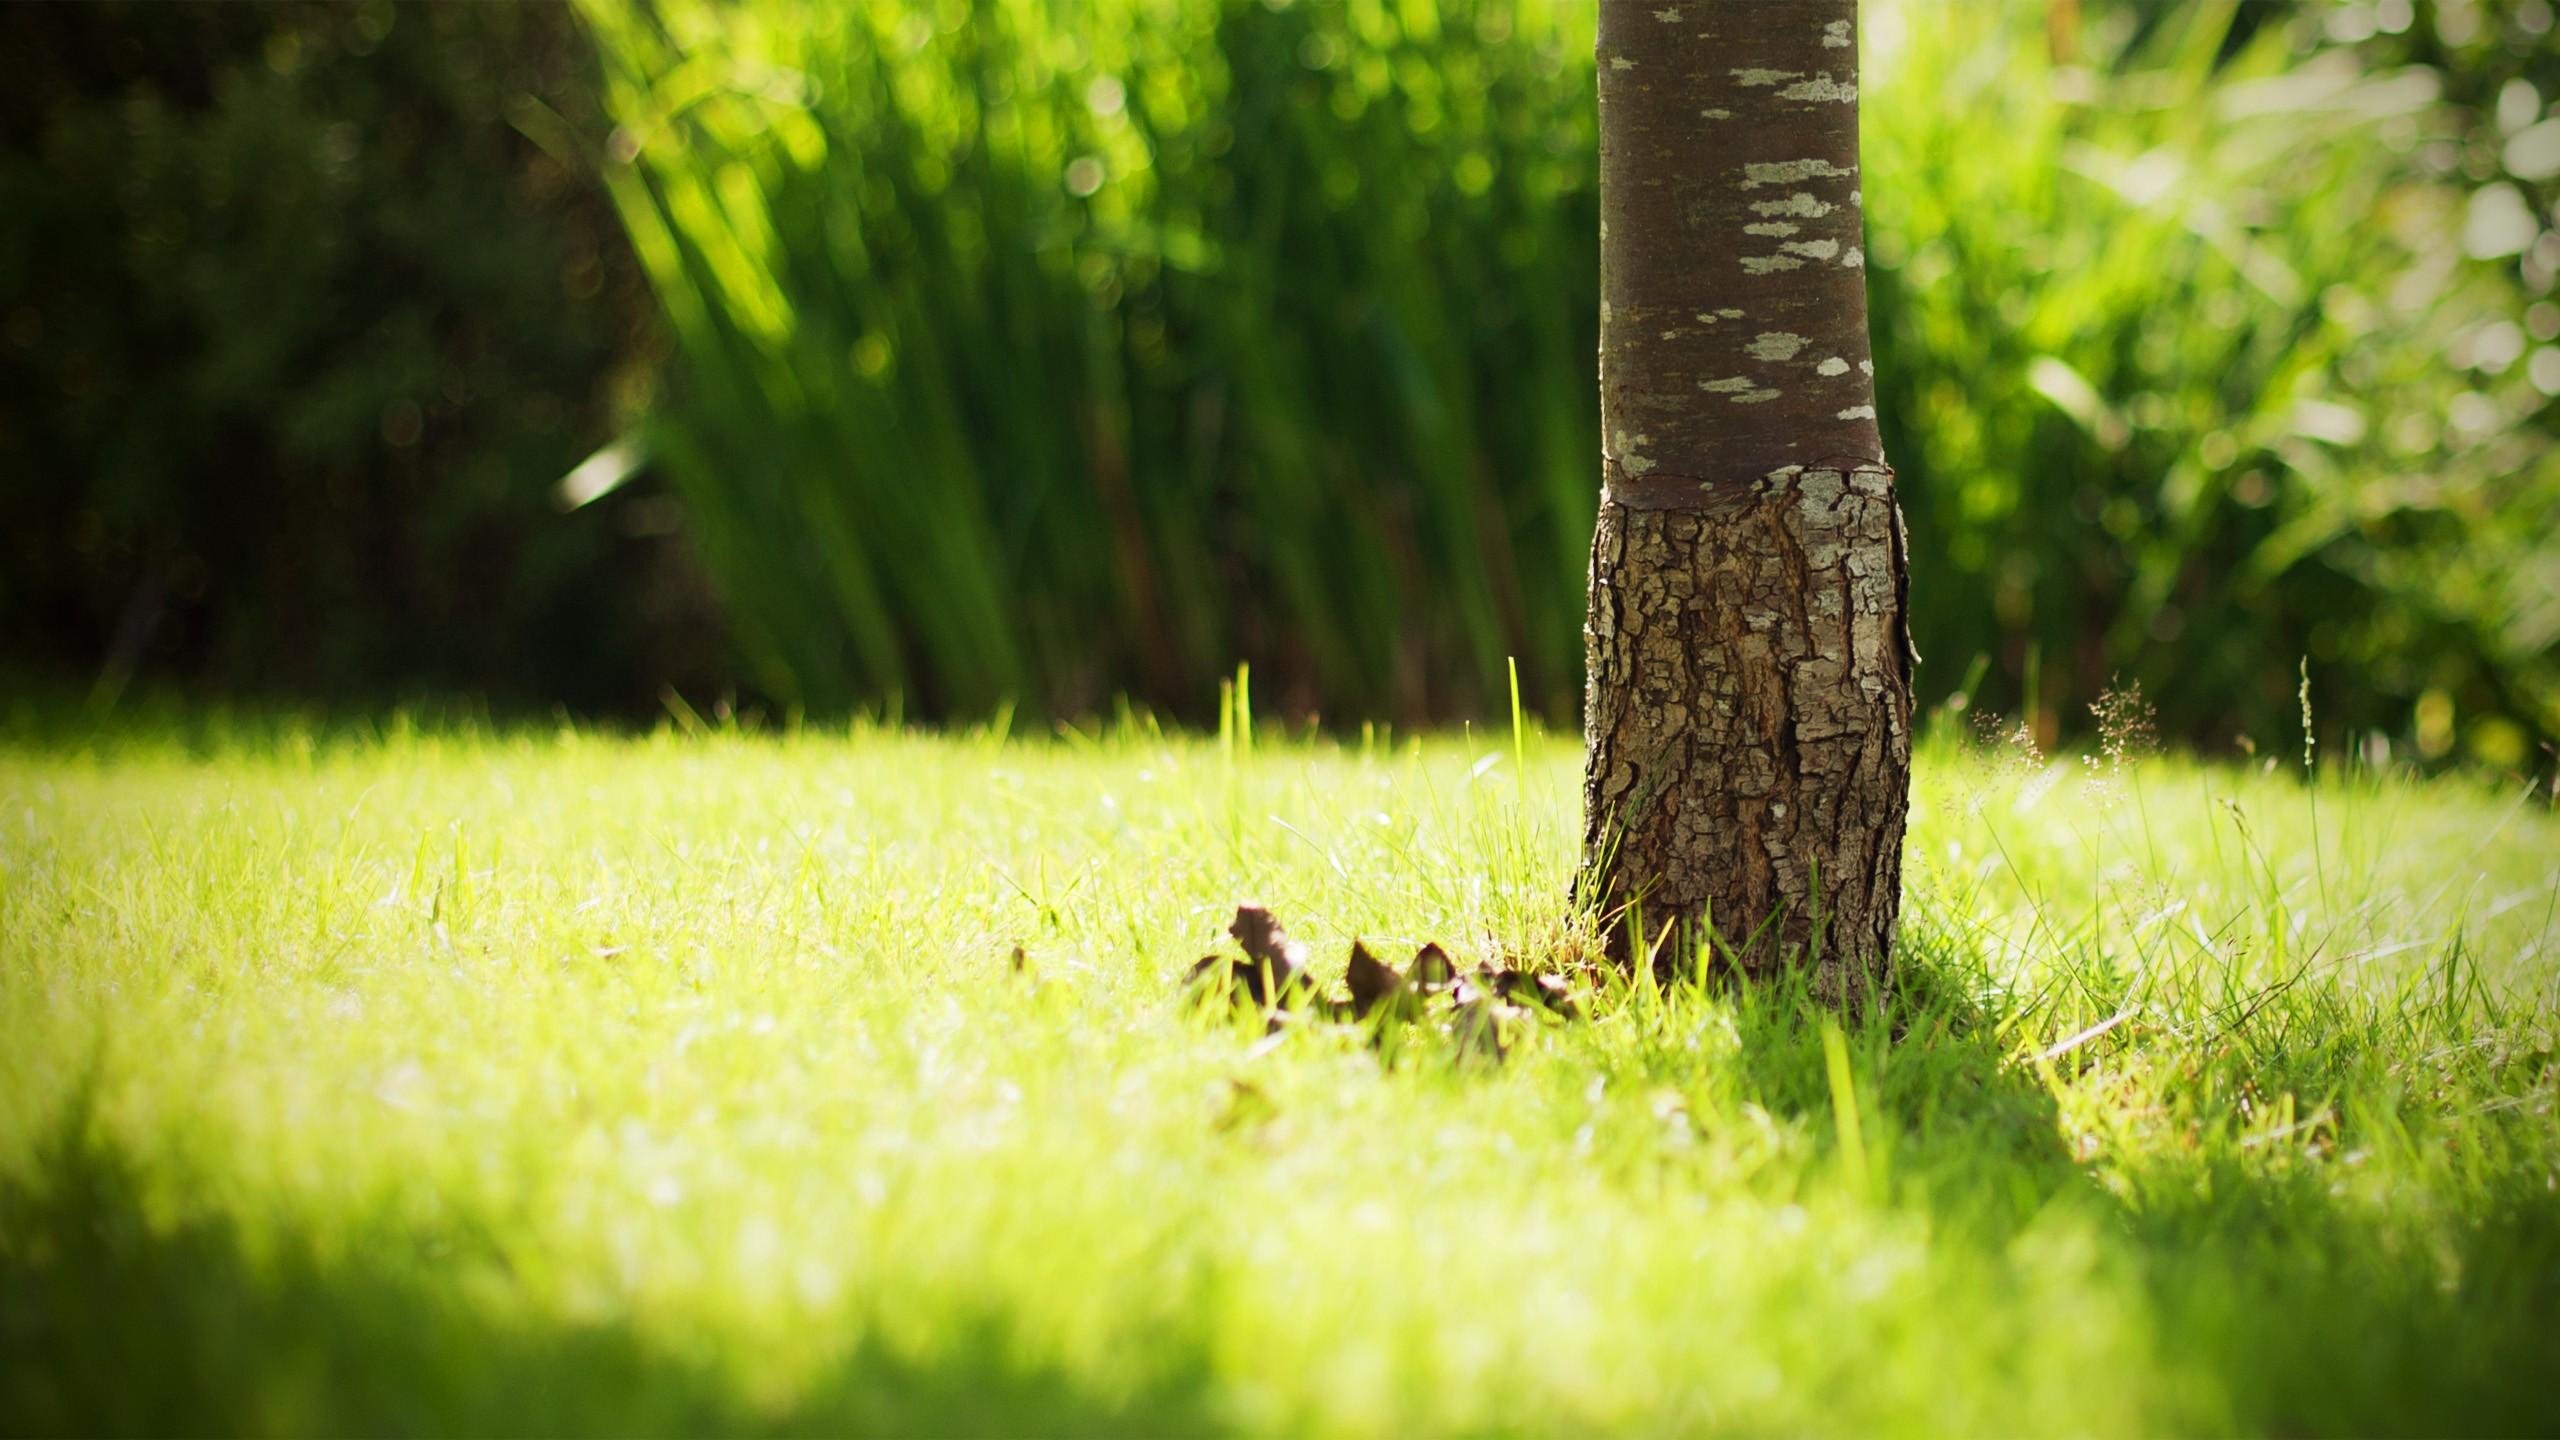 grass pictures tree - HD Desktop Wallpapers | 4k HD